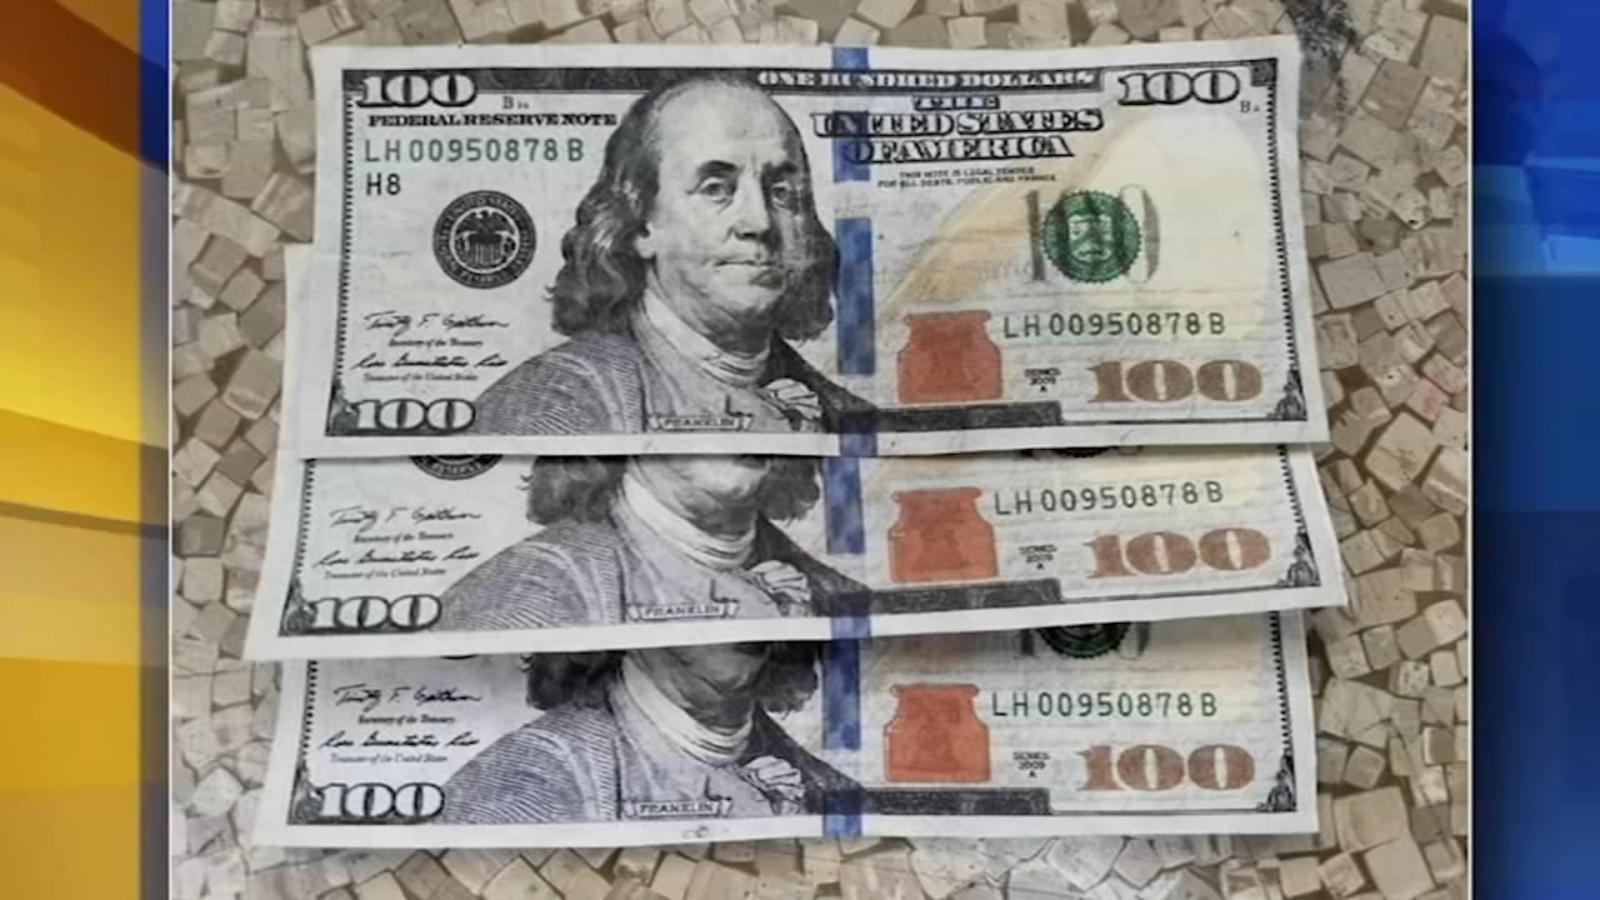 Secret Service warns of new fake $100 bills during holiday season